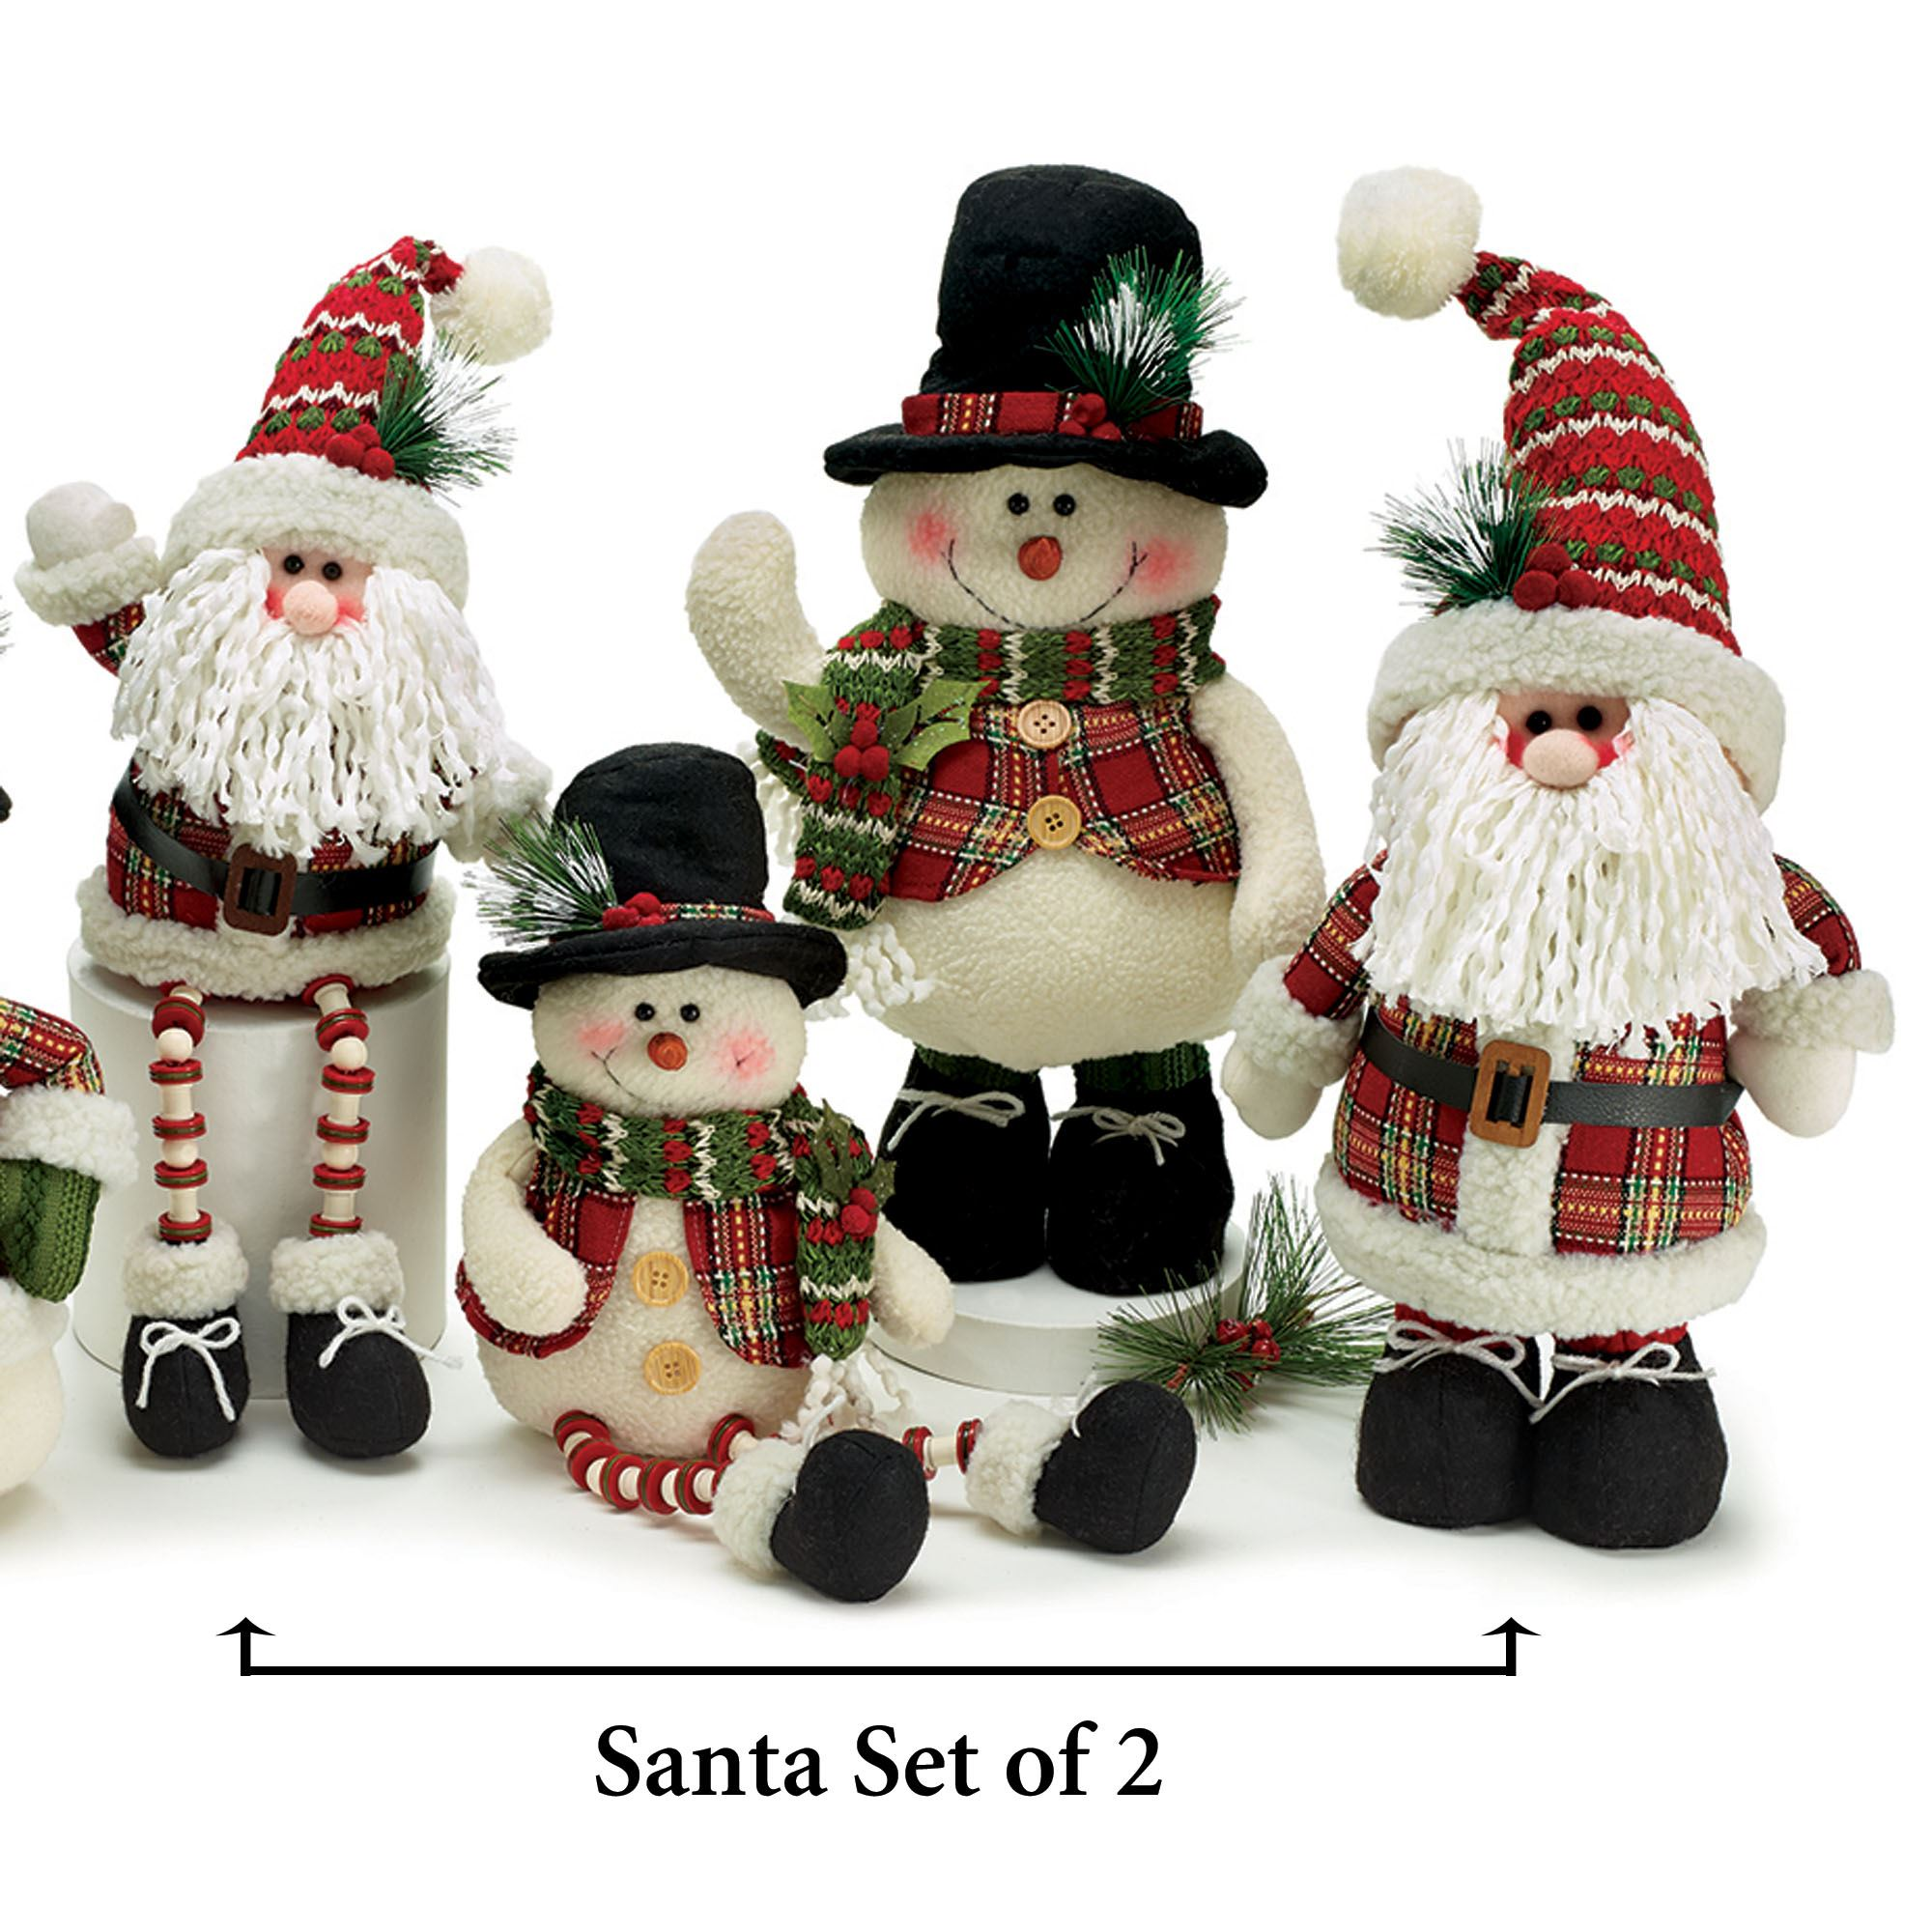 Christmas Plaid Santas Red Set Of Two